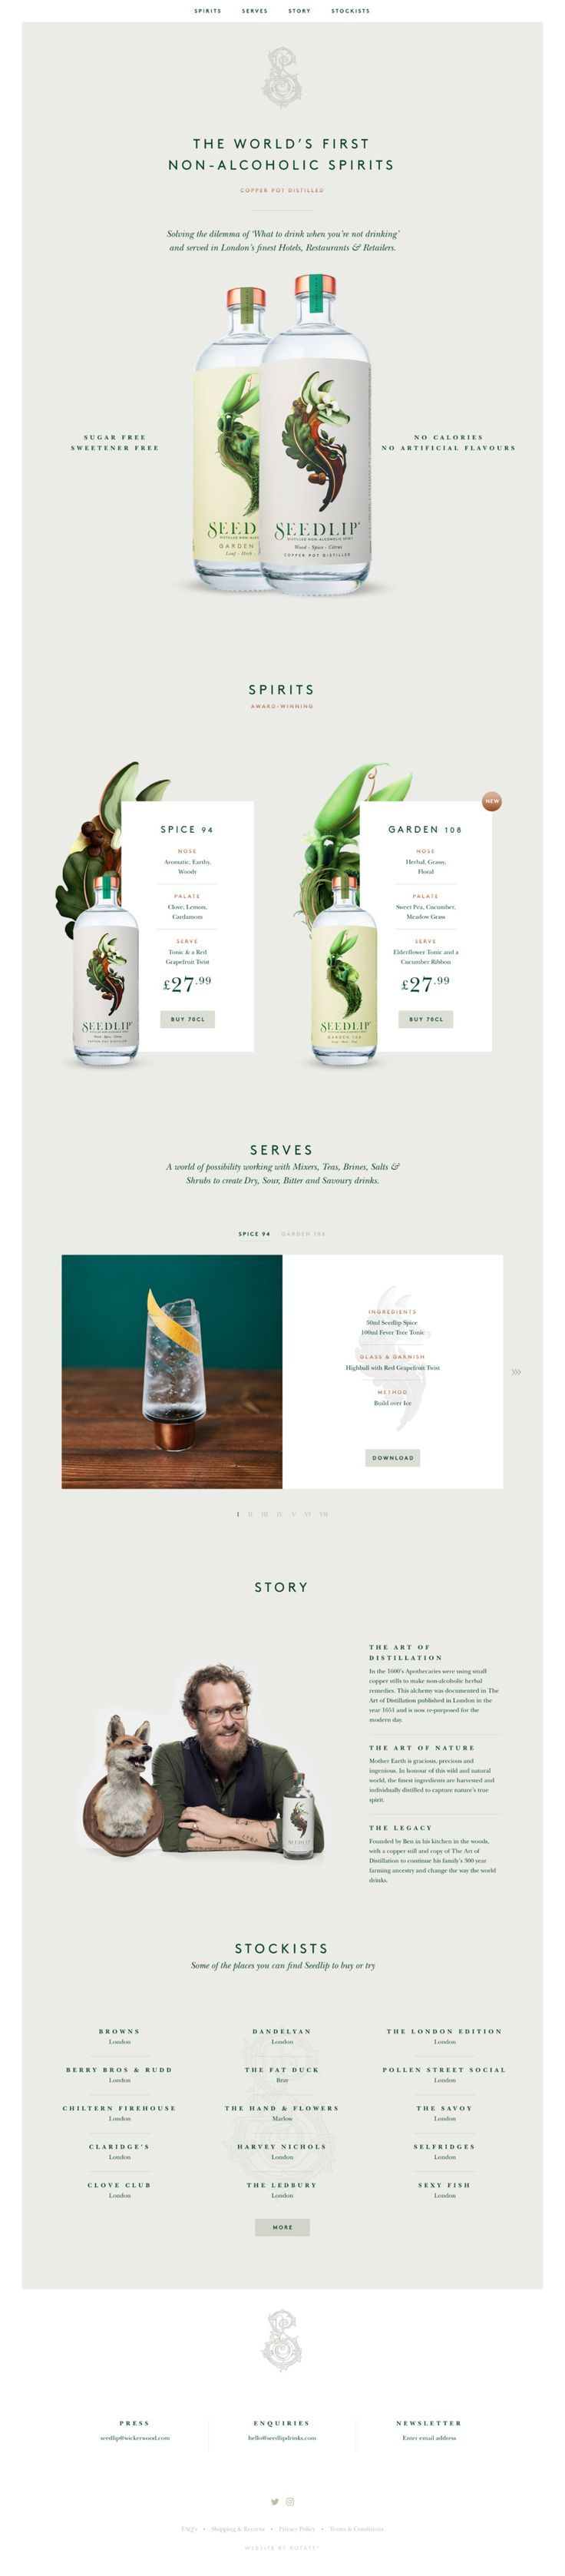 55 Best Hennessy Images On Pinterest